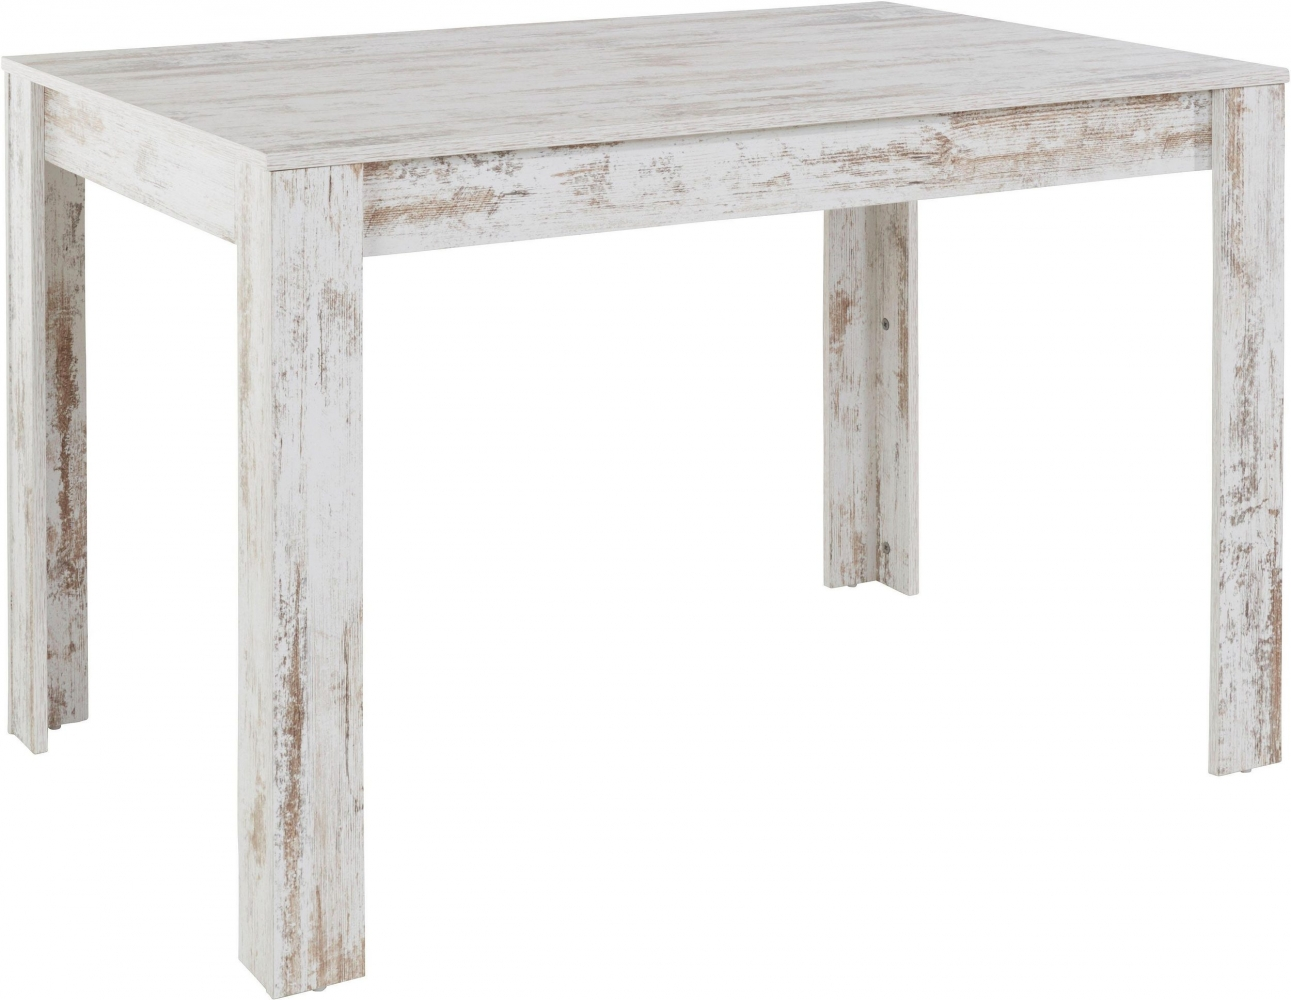 Jídelní stůl Lora II., 120 cm, bílá